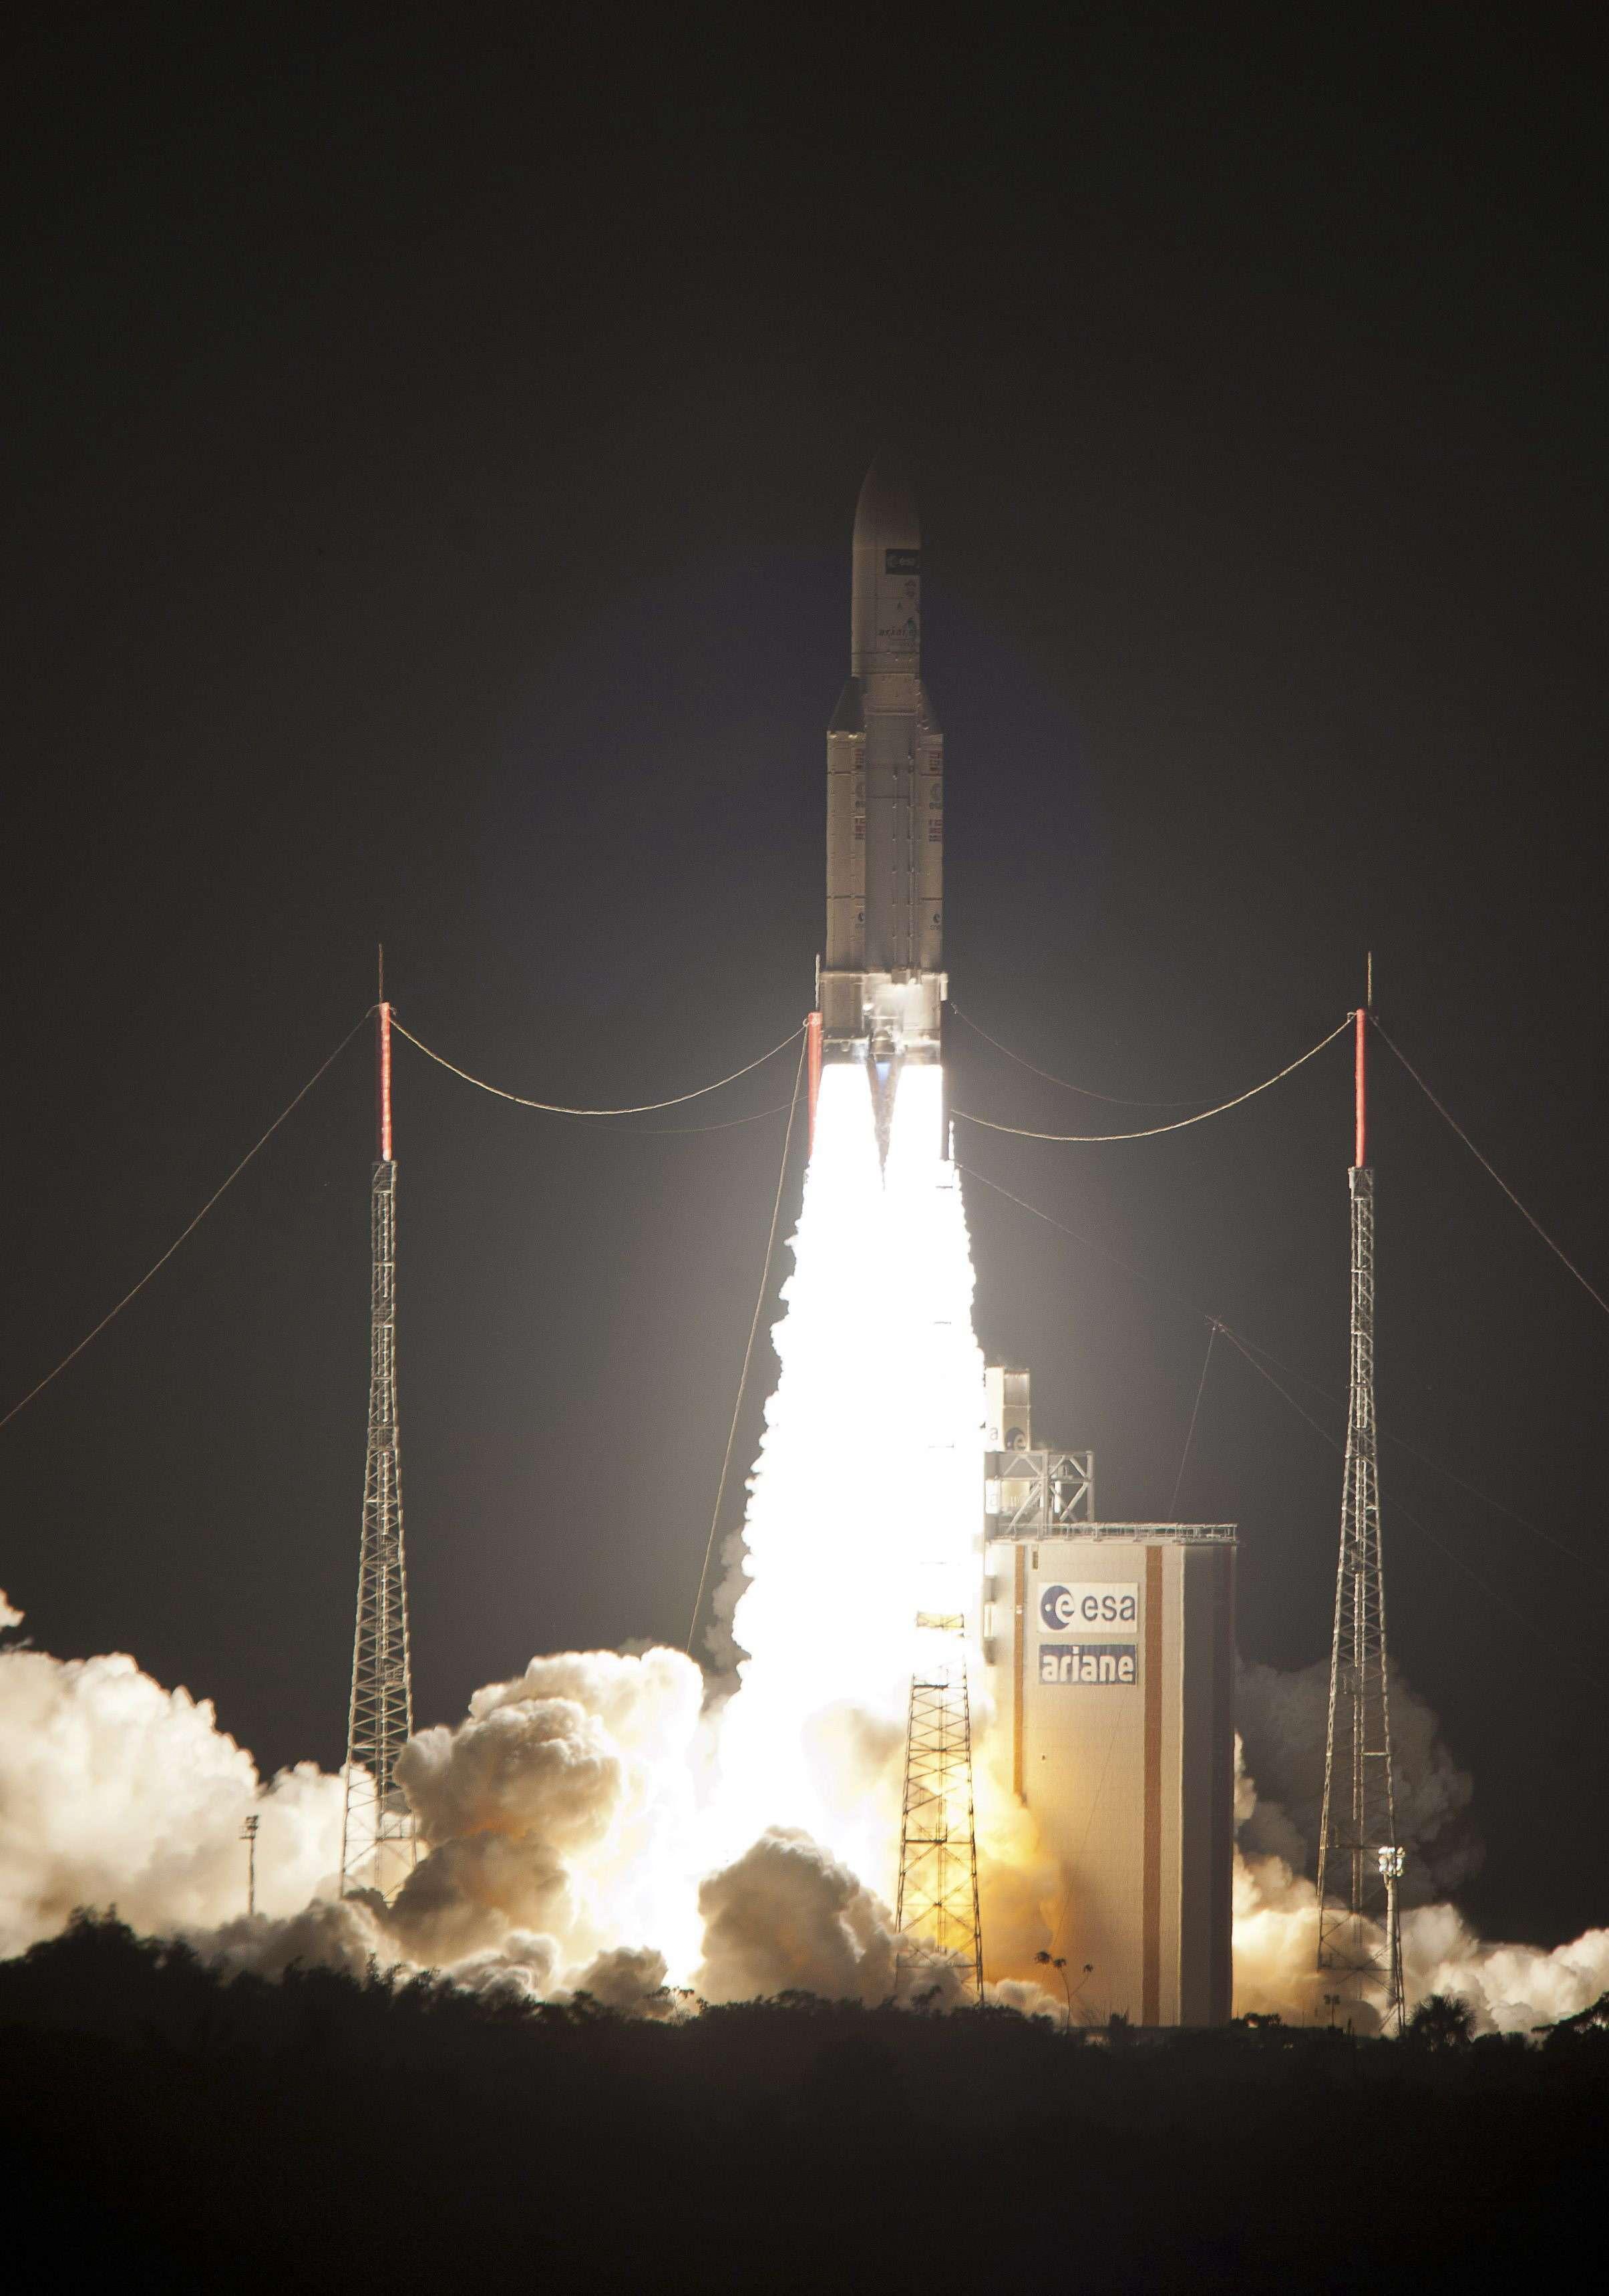 Agência Espacial Francesa